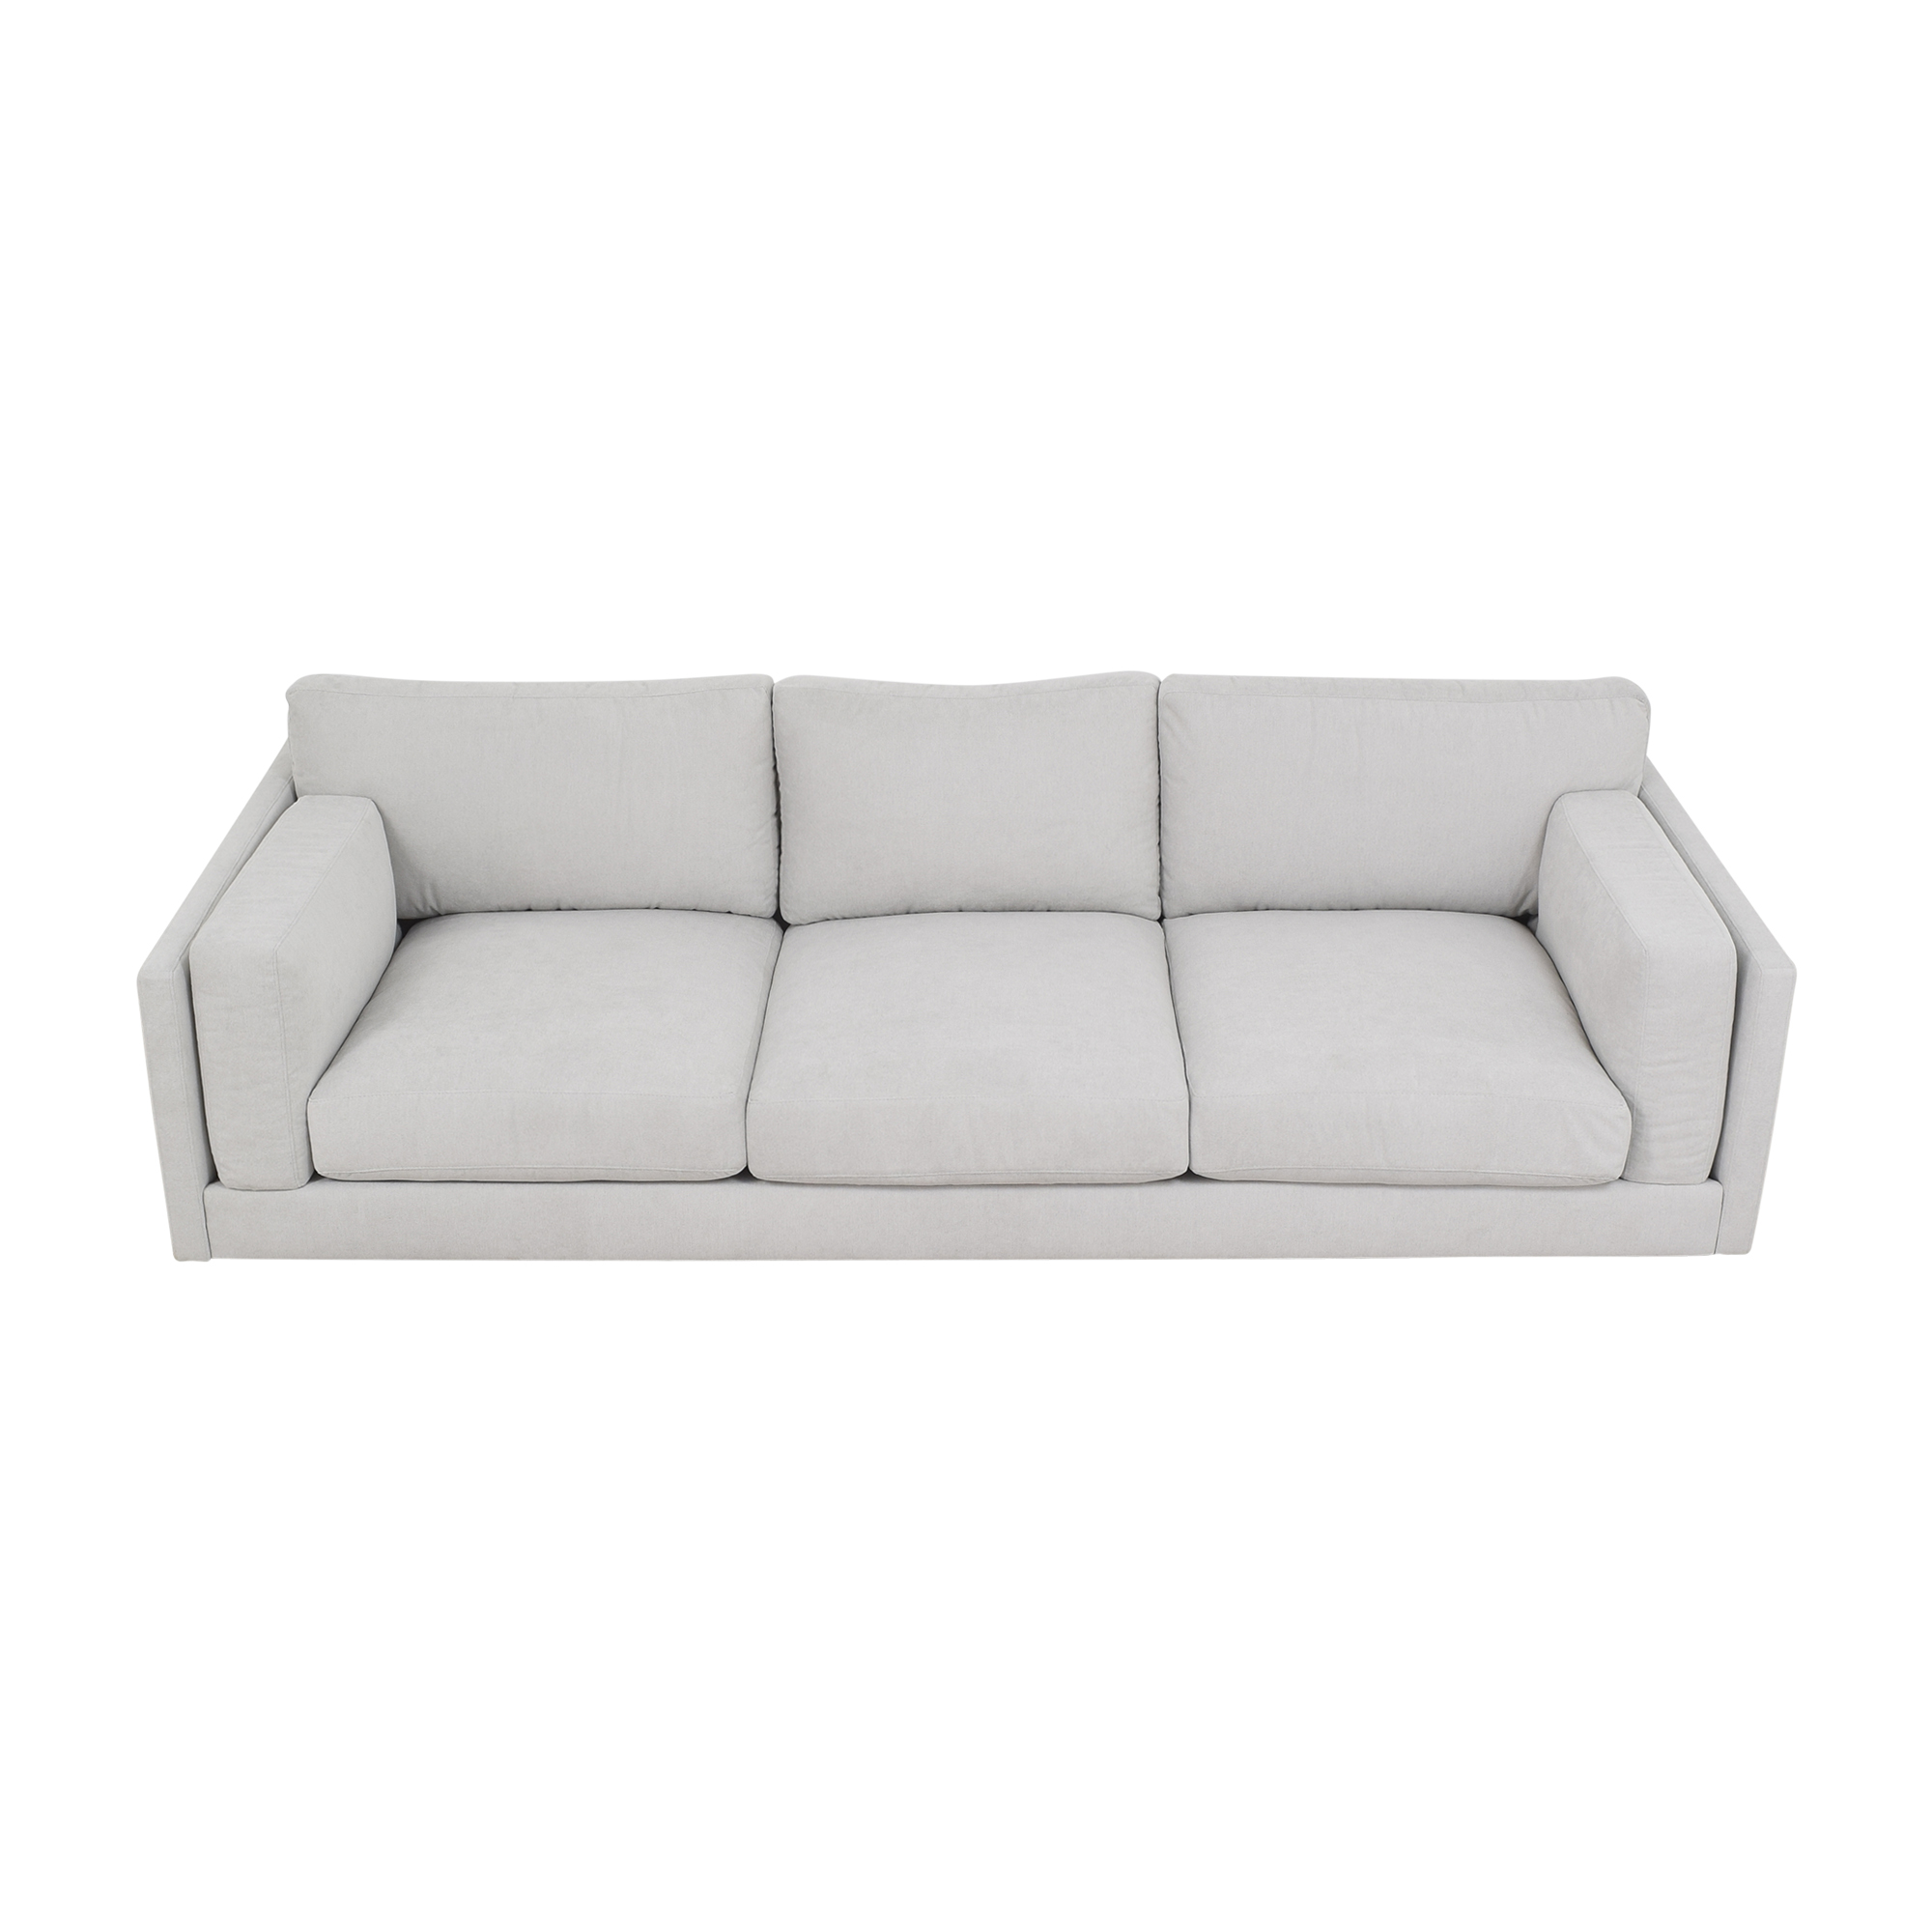 BenchMade Modern BenchMade Modern Skinny Fat Sofa light gray